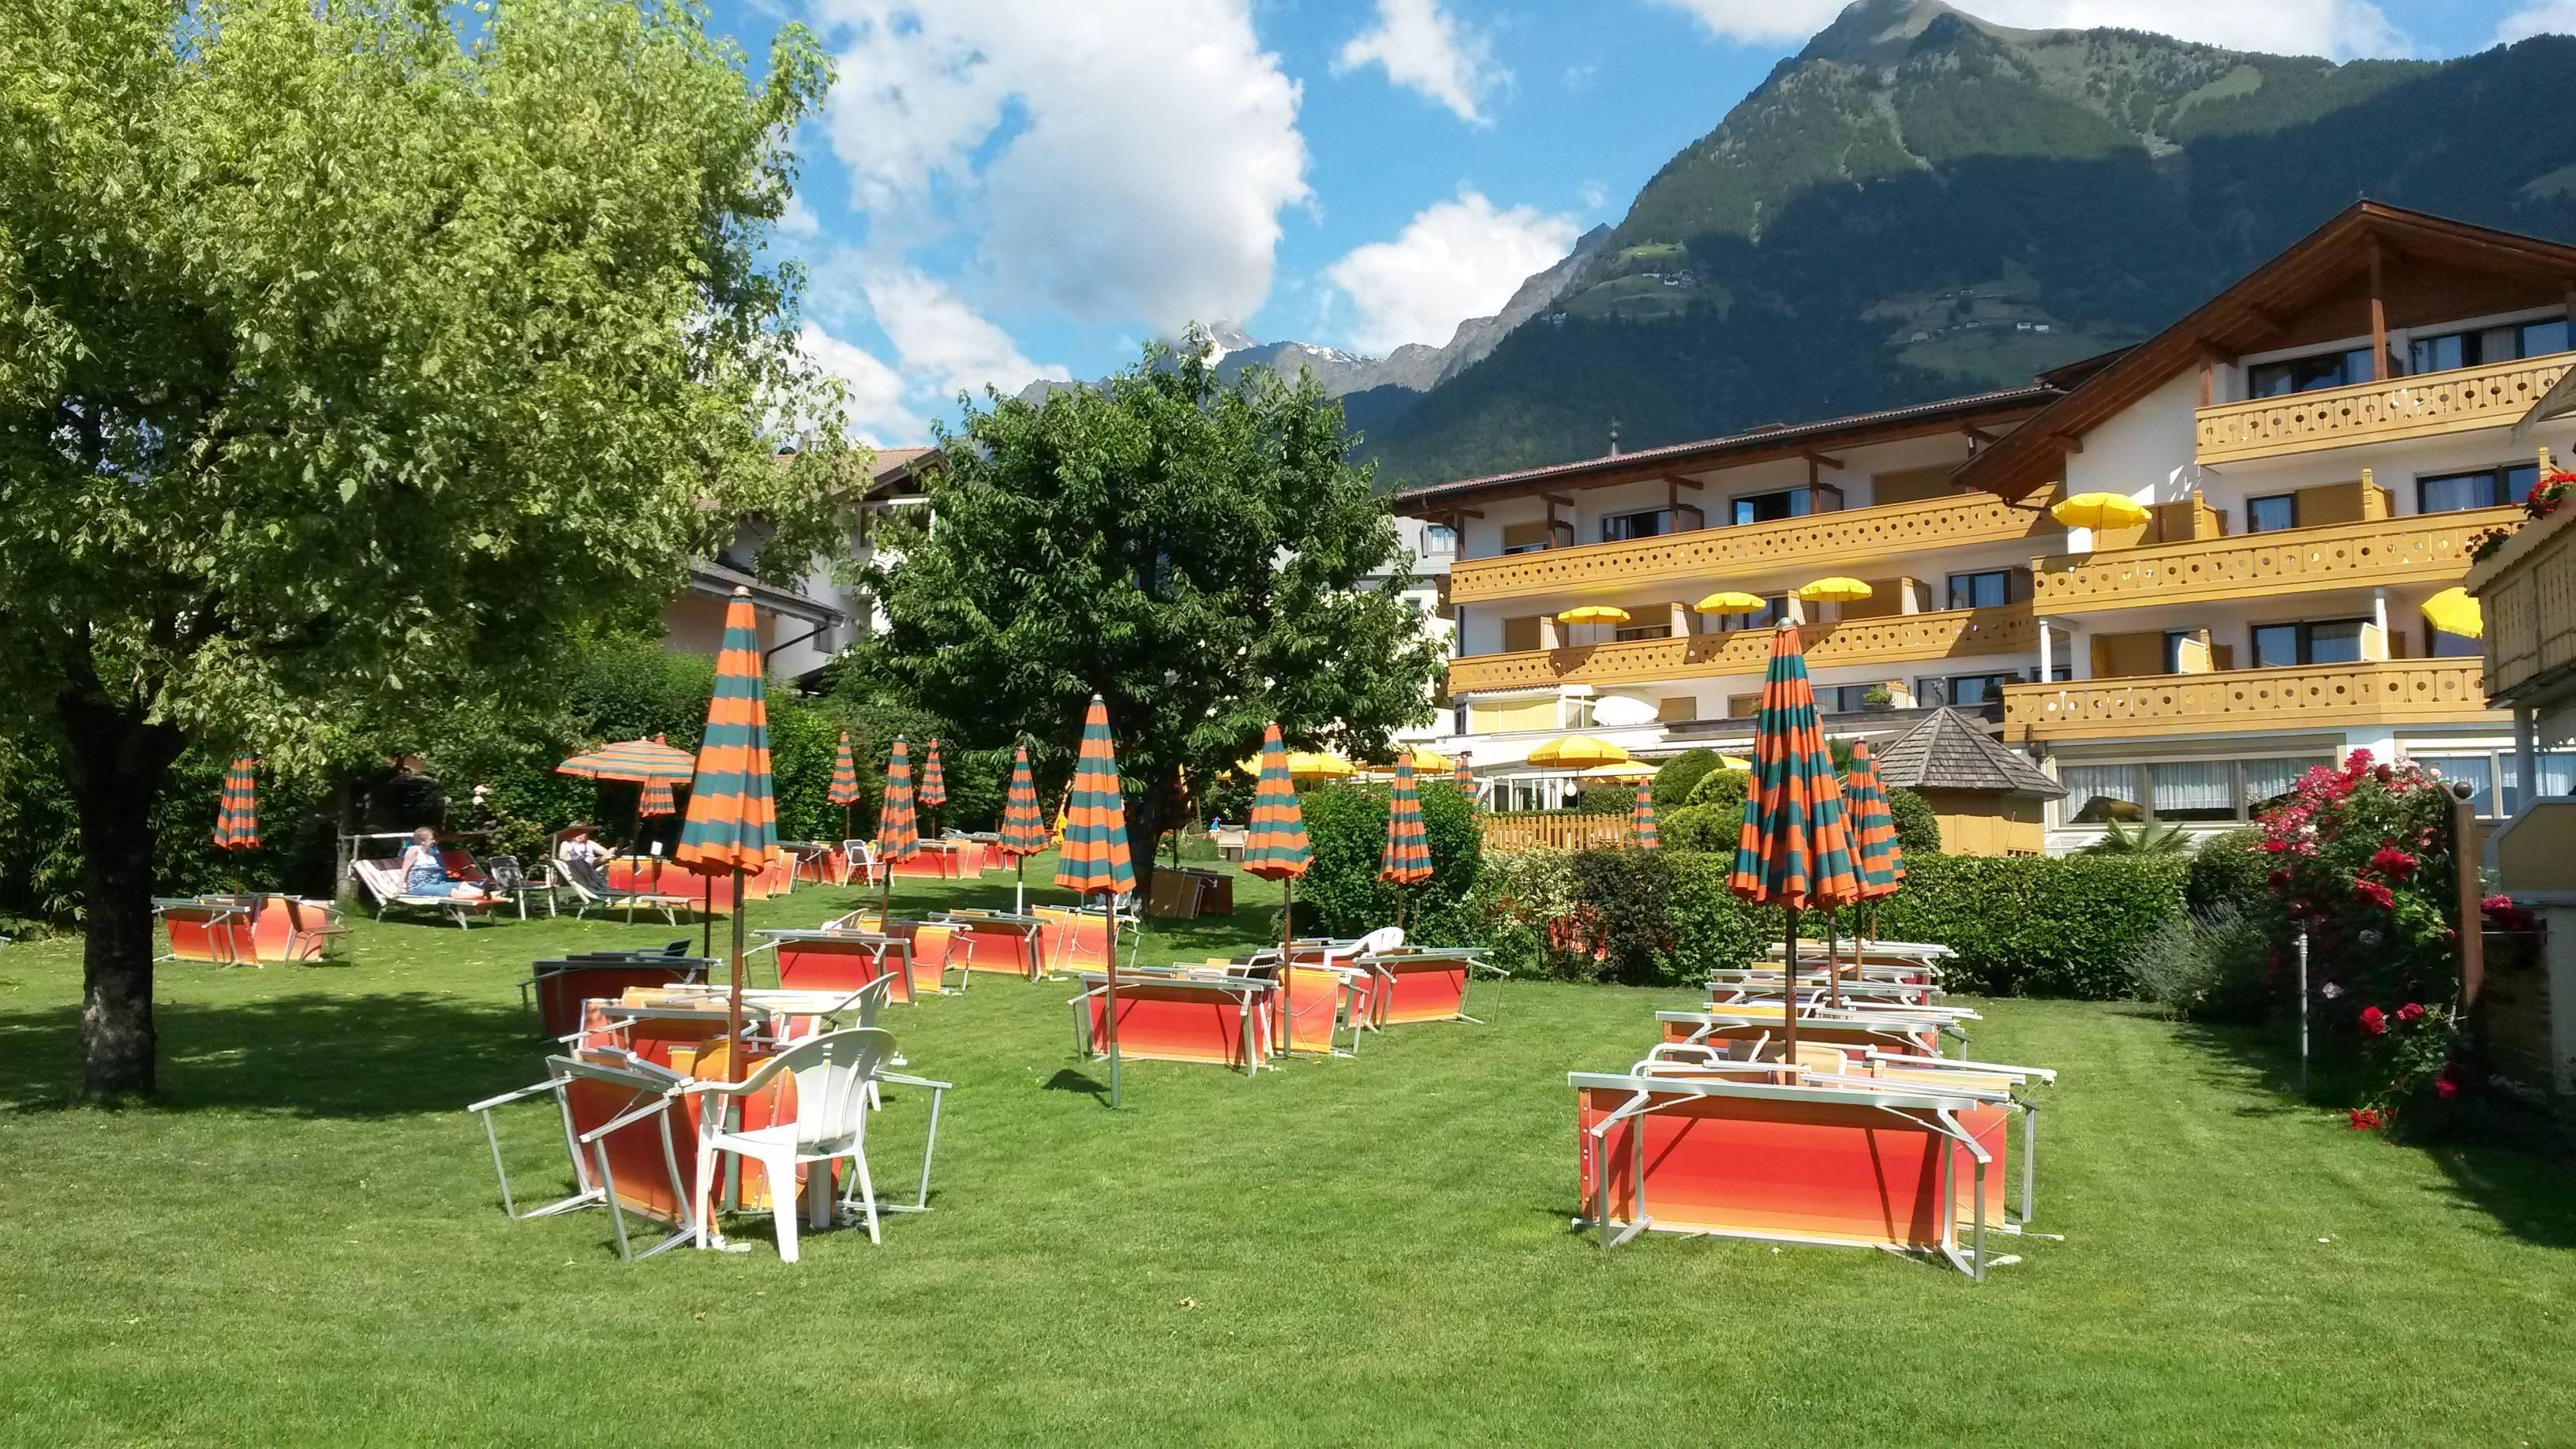 Hotel laurin in tirolo dorf tirol holidaycheck for Design hotel dorf tirol